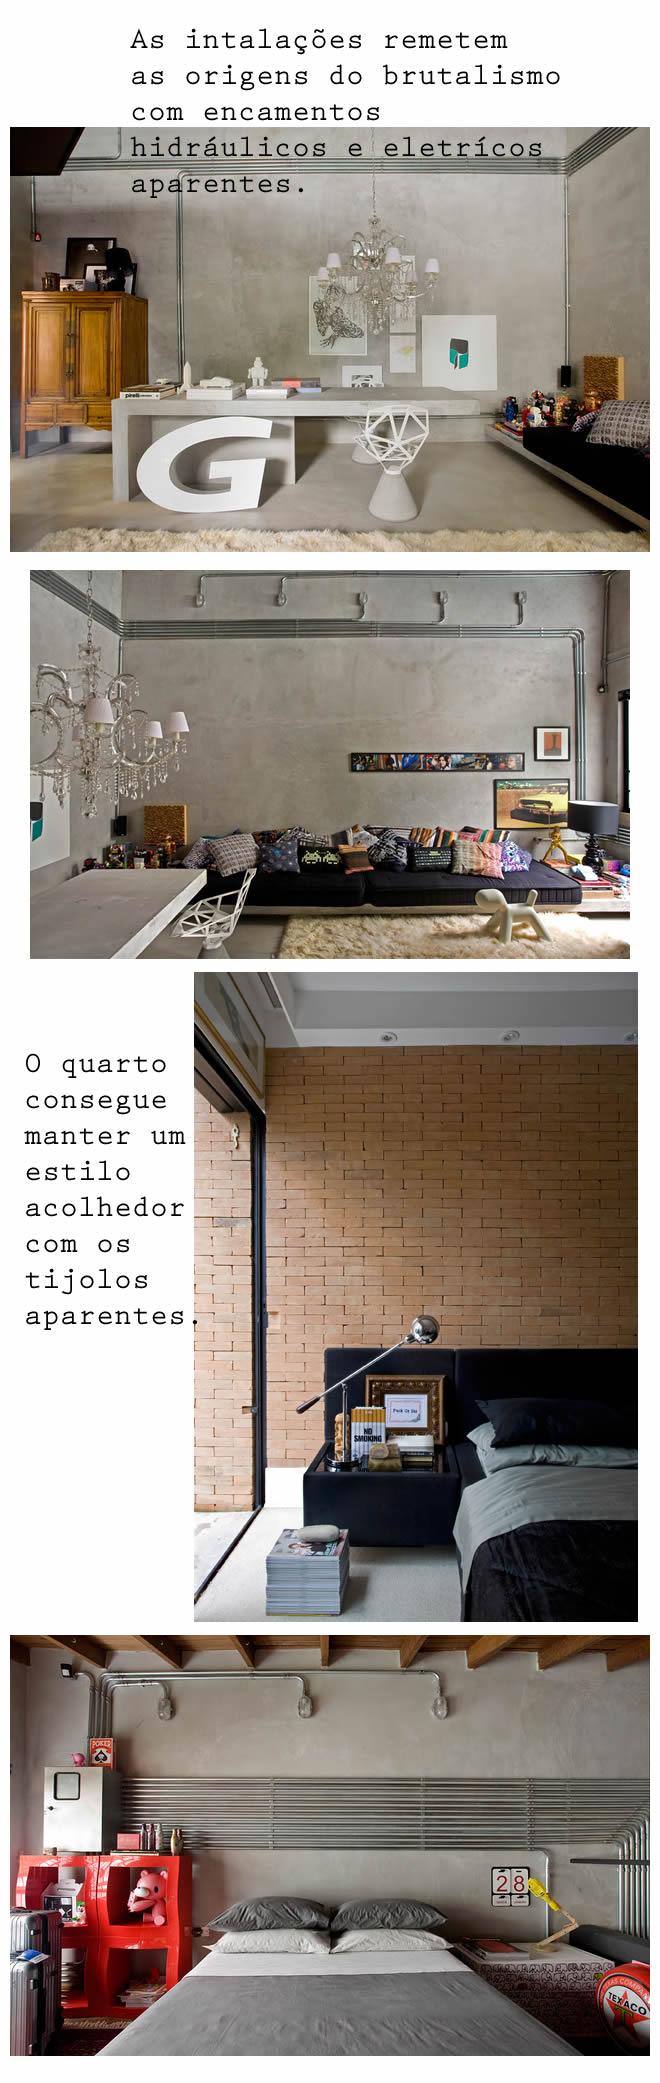 Fonte: http://studiorobertoreis.com.br/wp-content/uploads/2011/12/ARQUITETURA-BRUTALISTA-COMPLETO.jpg